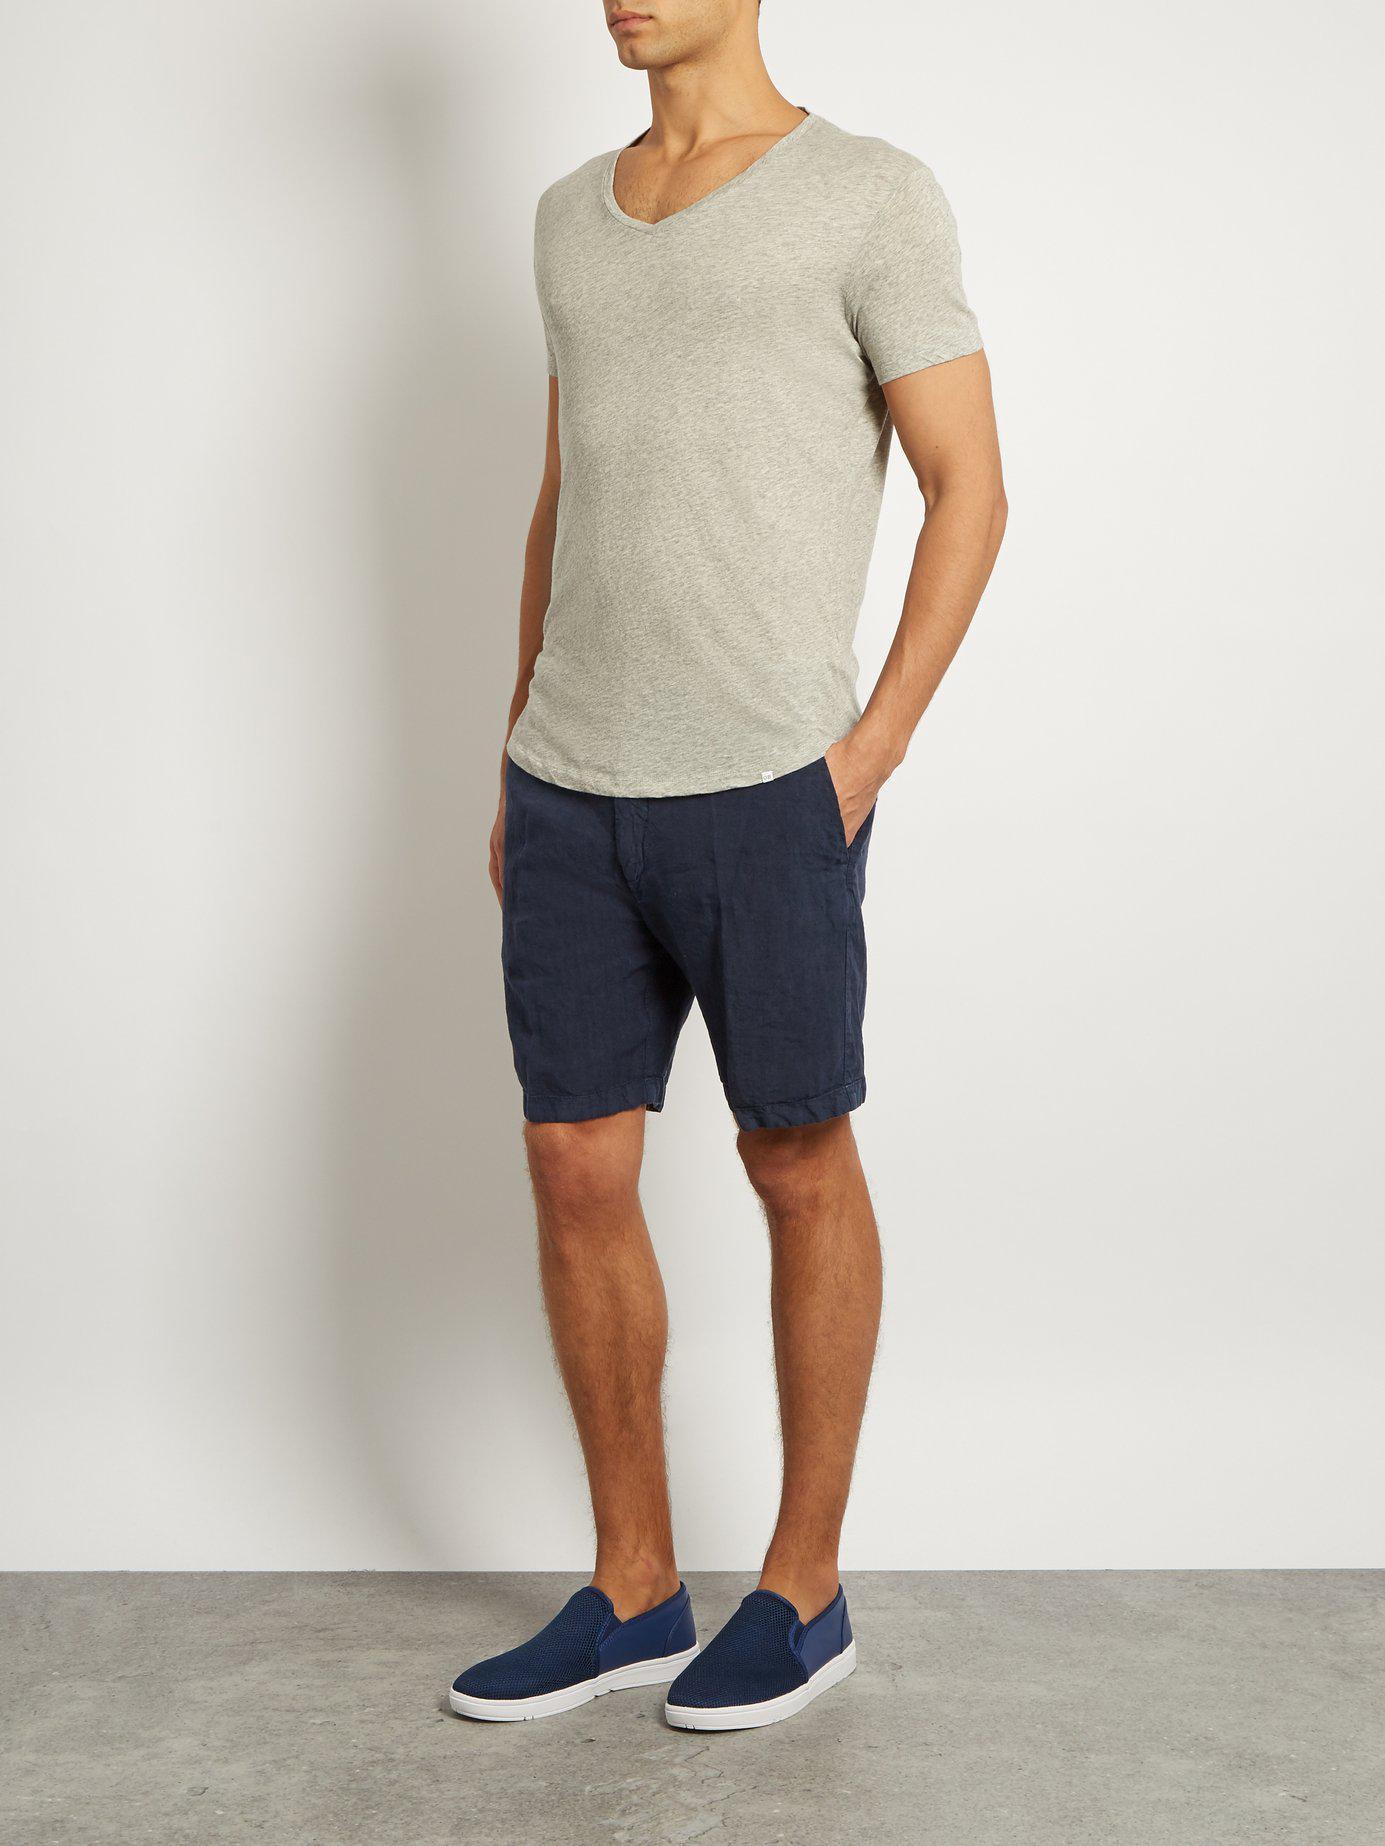 542d715f3b4 Lyst - Orlebar Brown OB V-Neck Cotton T-Shirt in Gray for Men